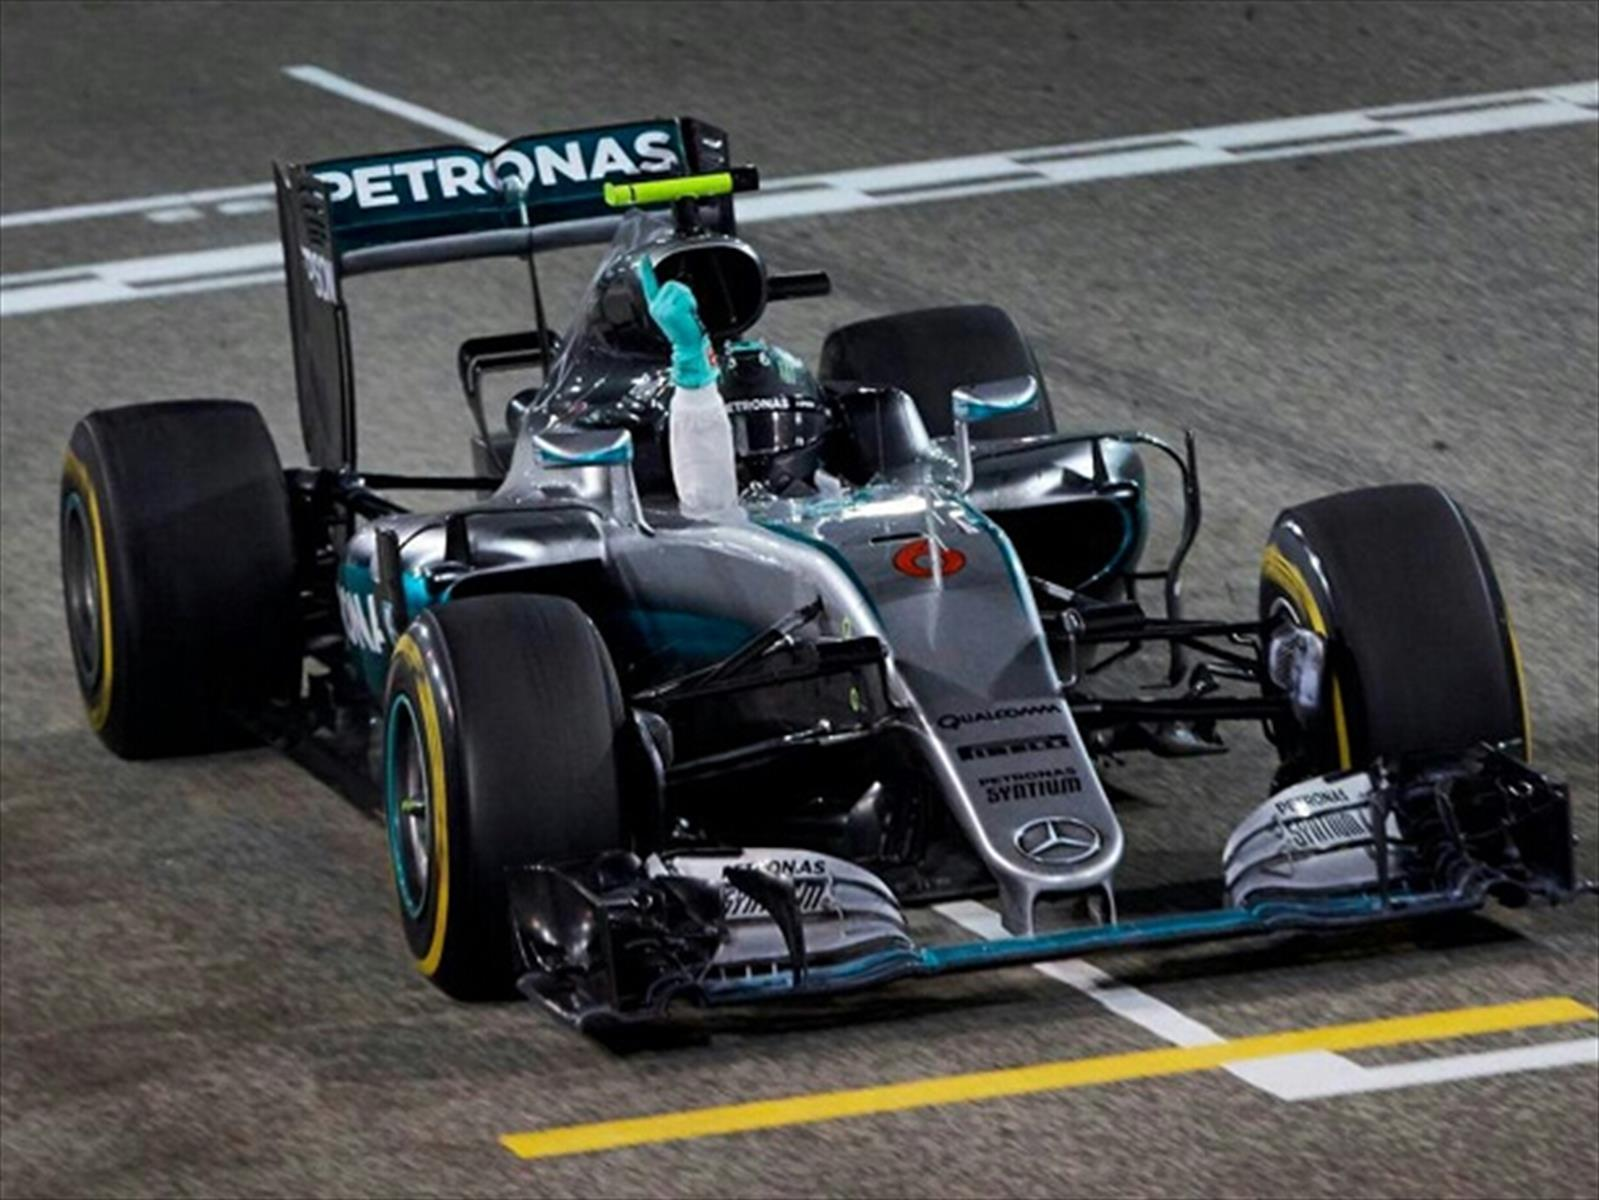 F1: GP de Bahrein, Rosber y Mercedes siguen al mando